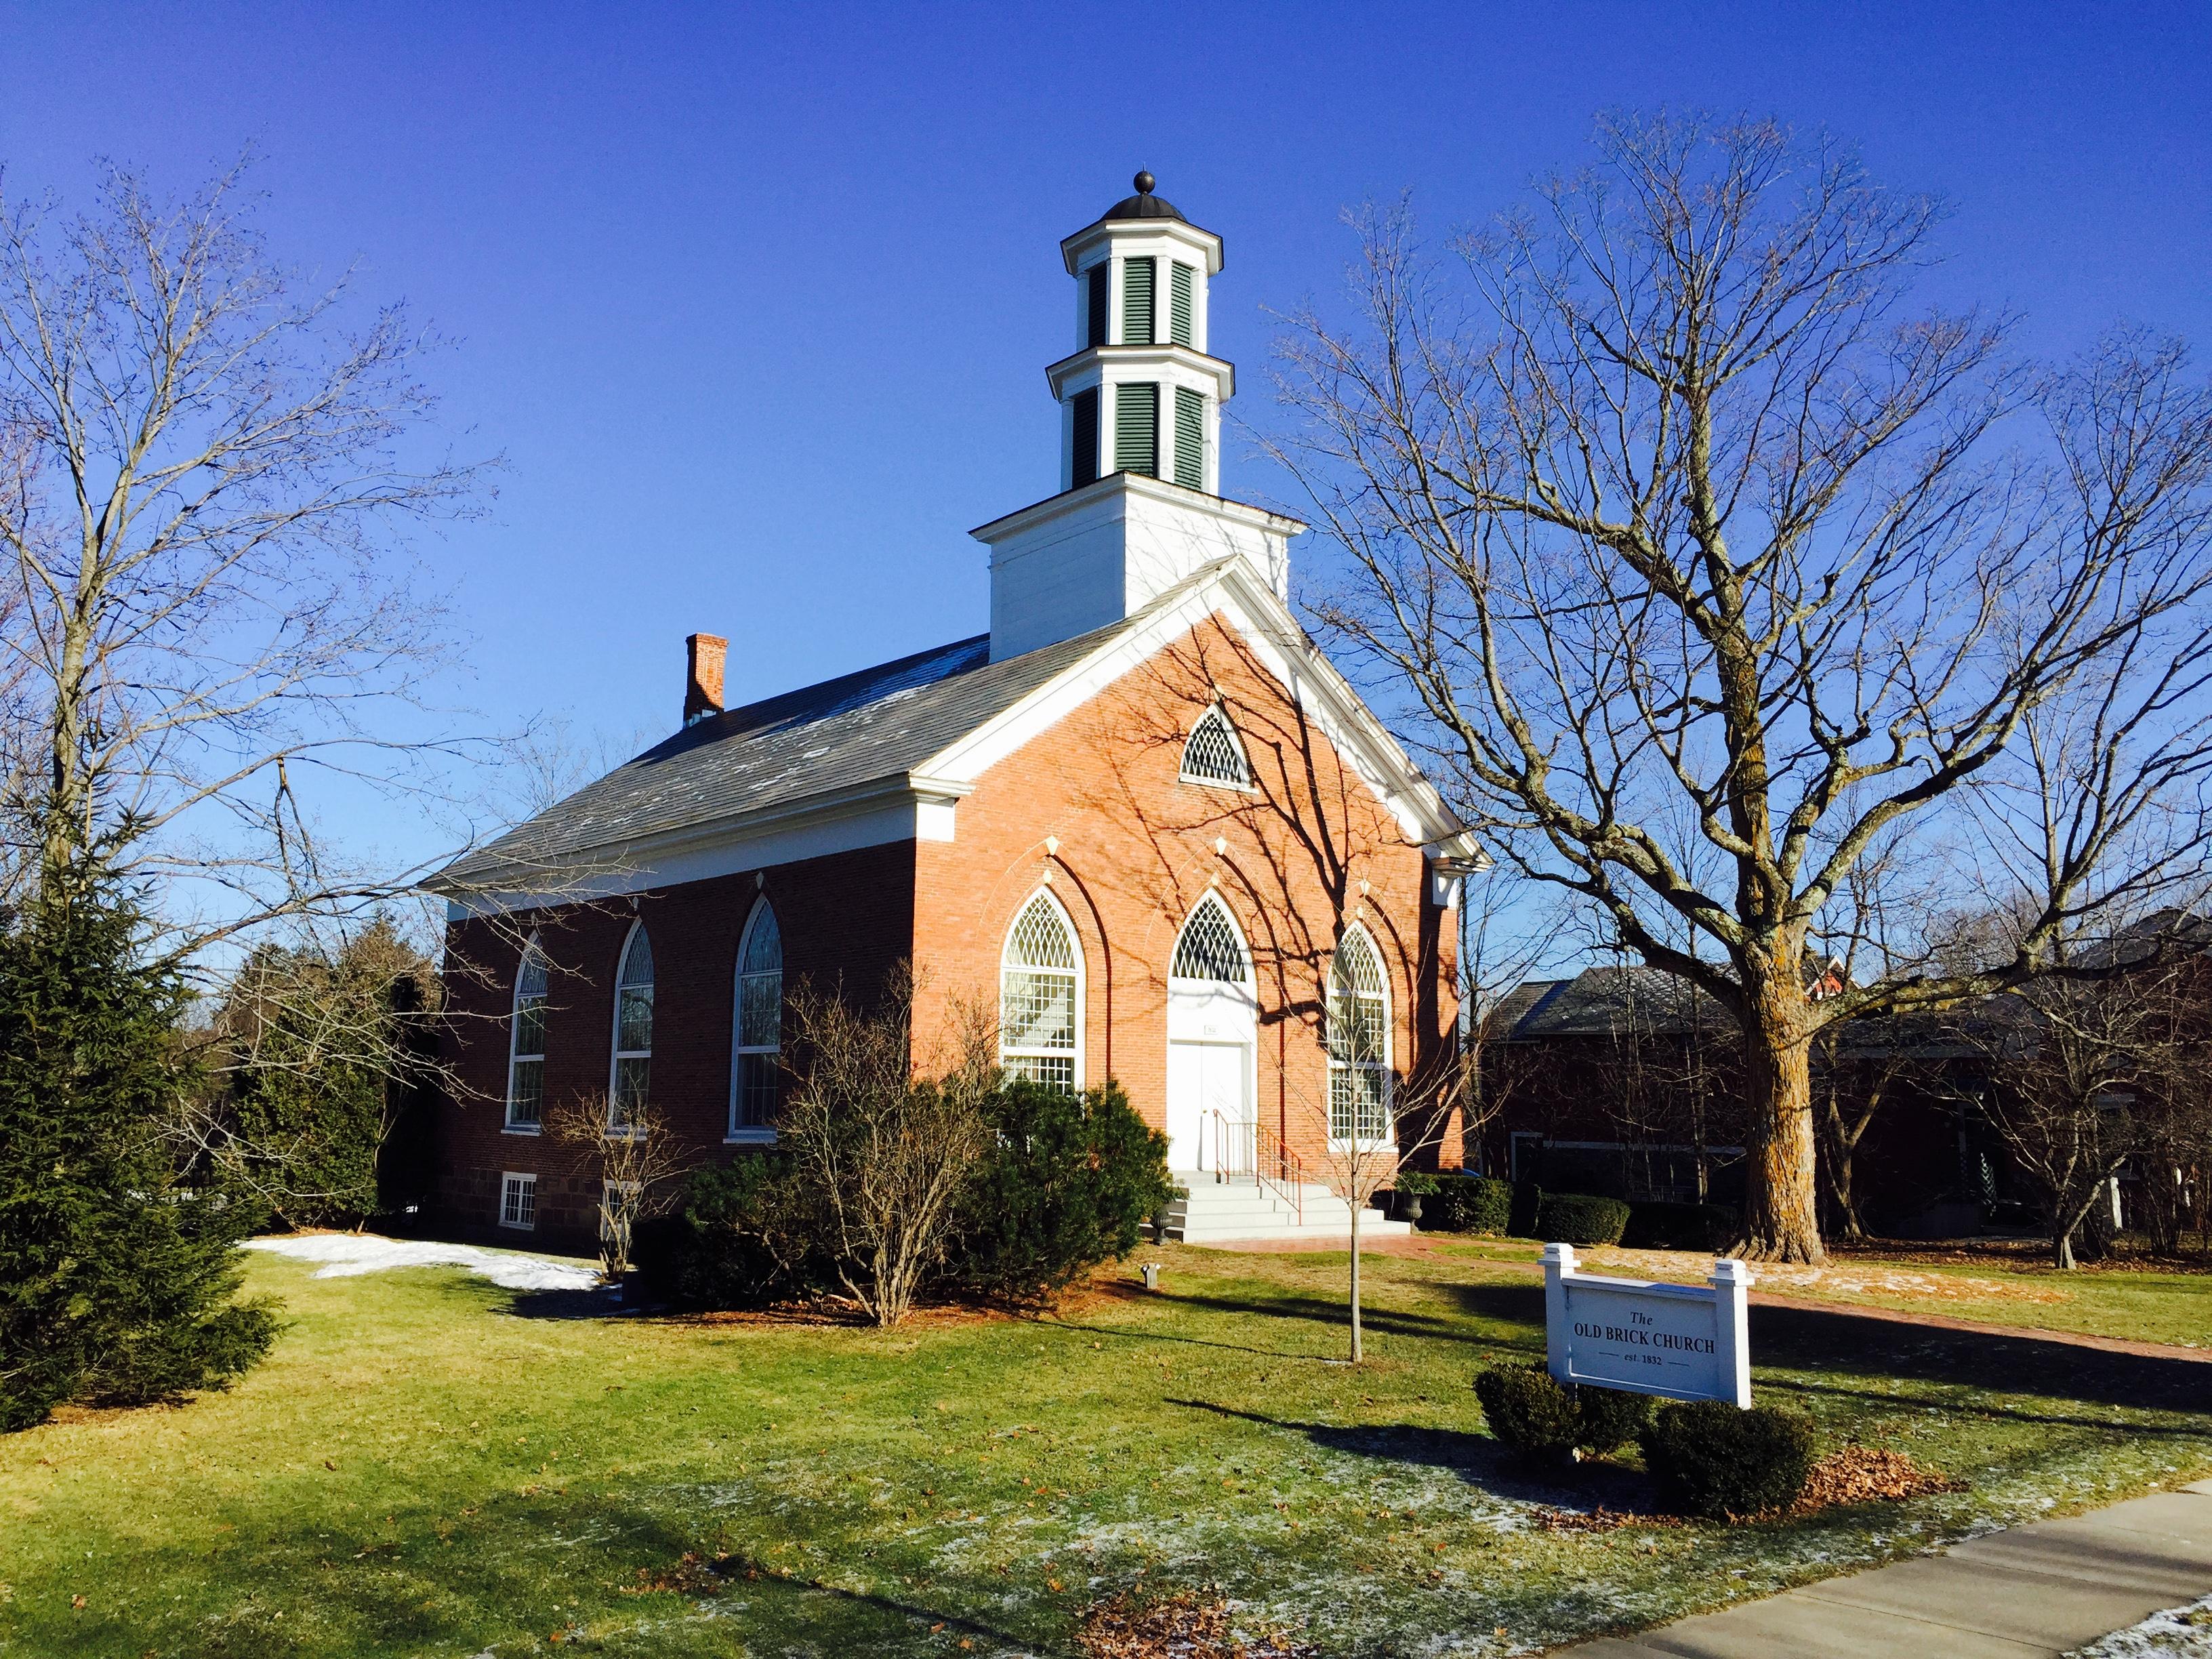 The Old Brick Church